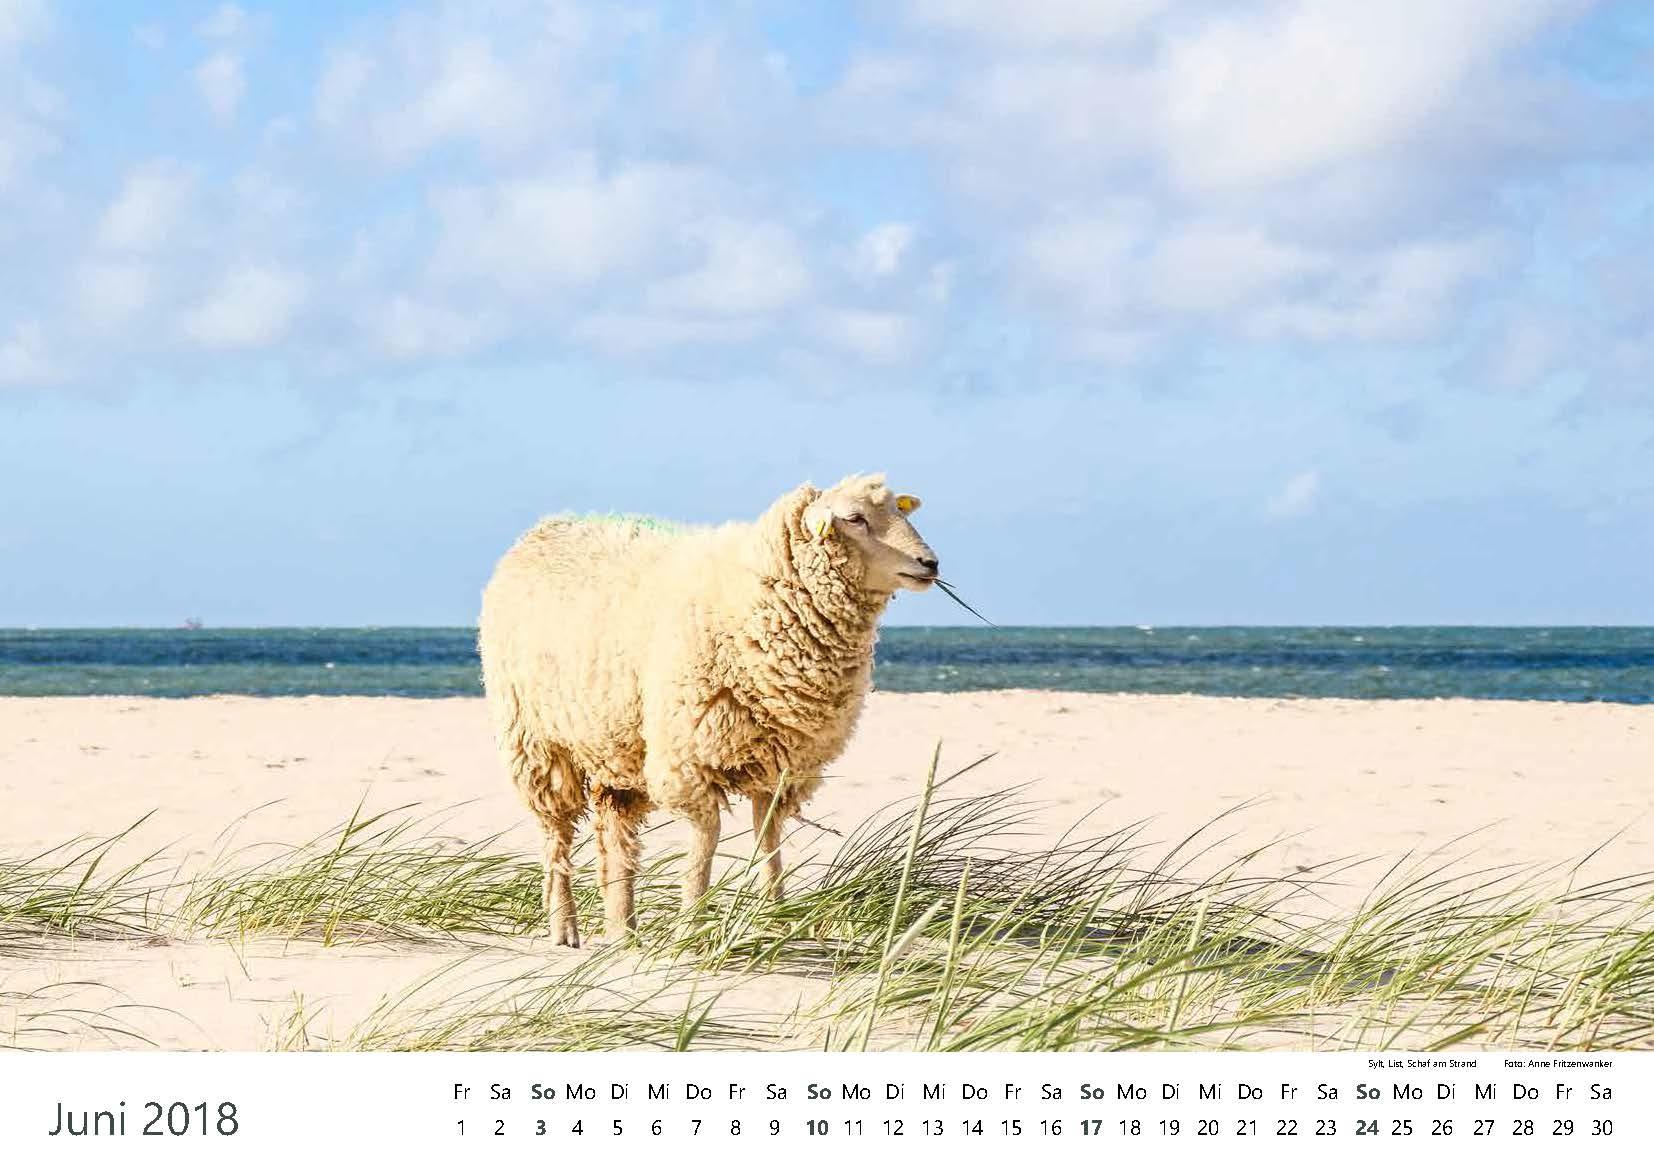 Sylt, List, Schaf am Strand